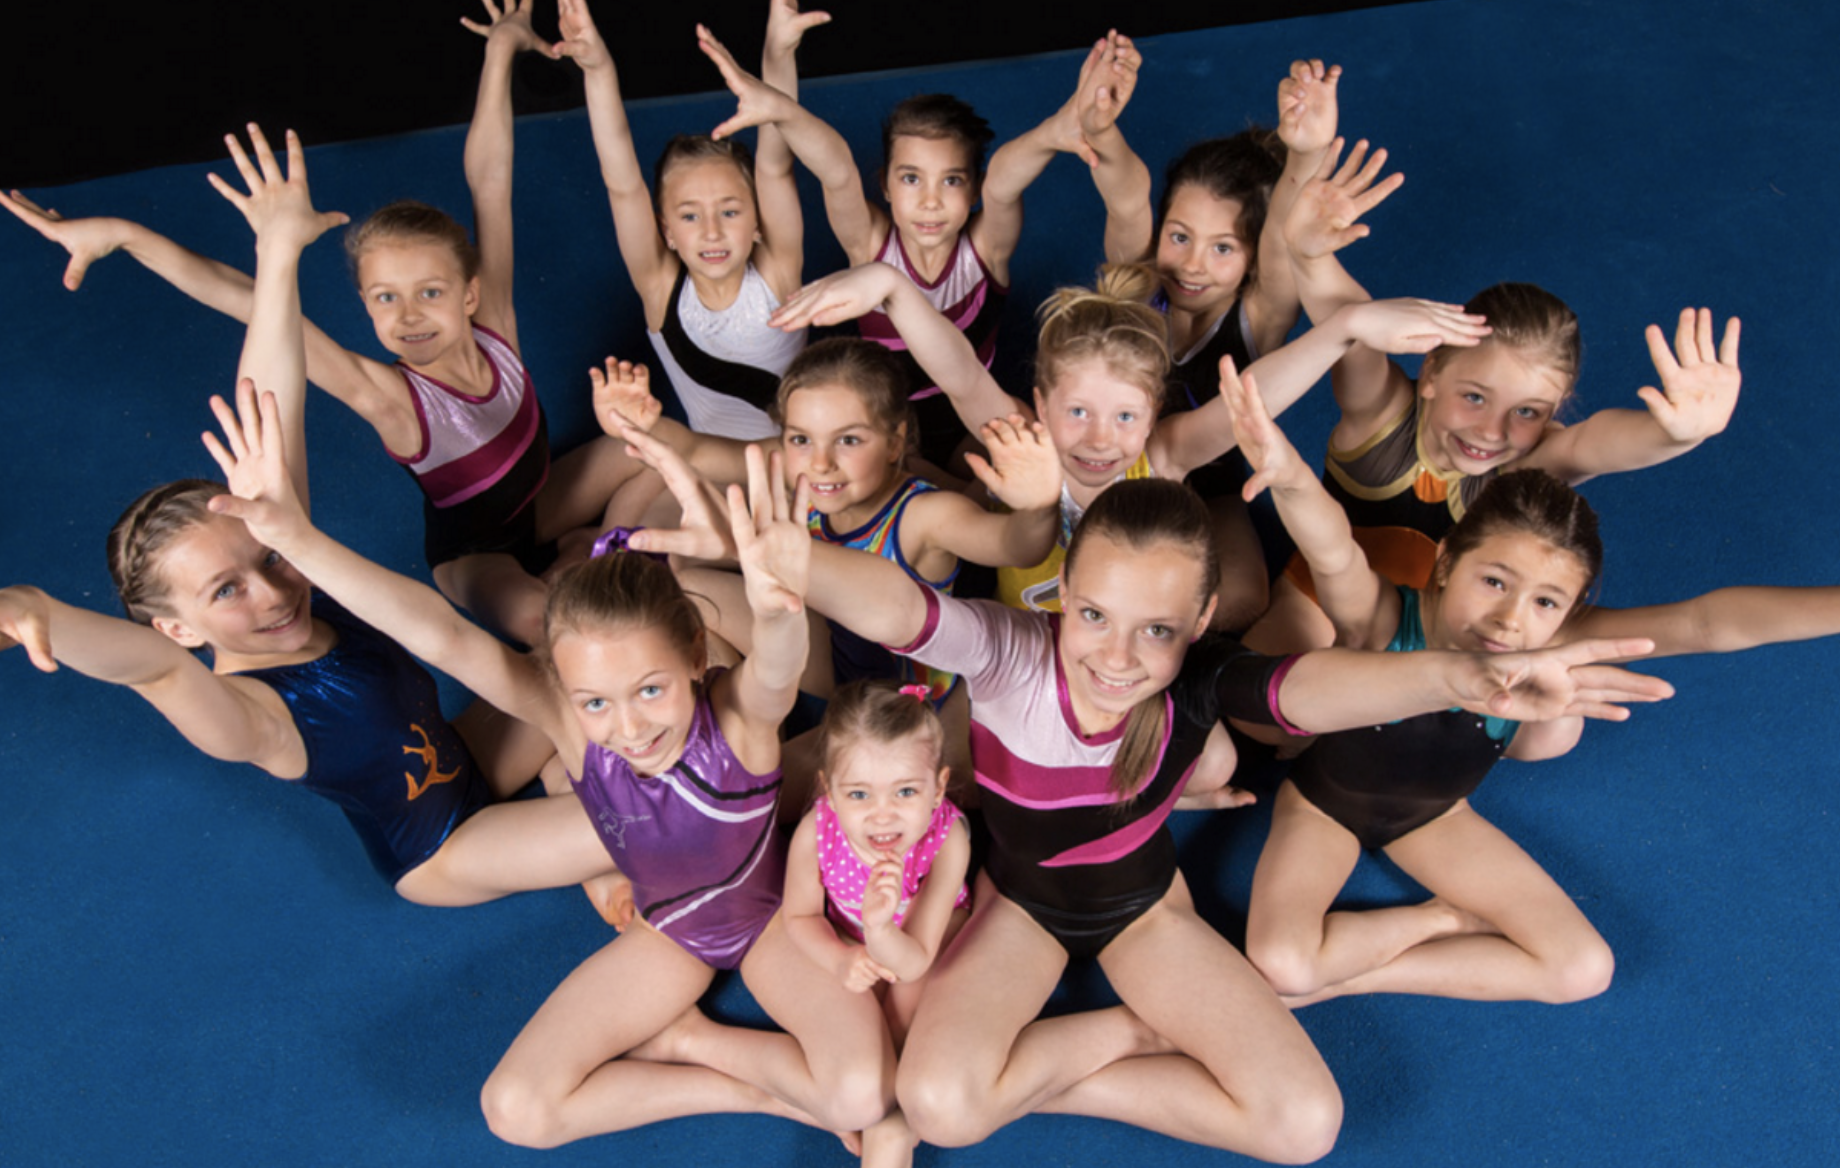 club de gymnastique québec performance